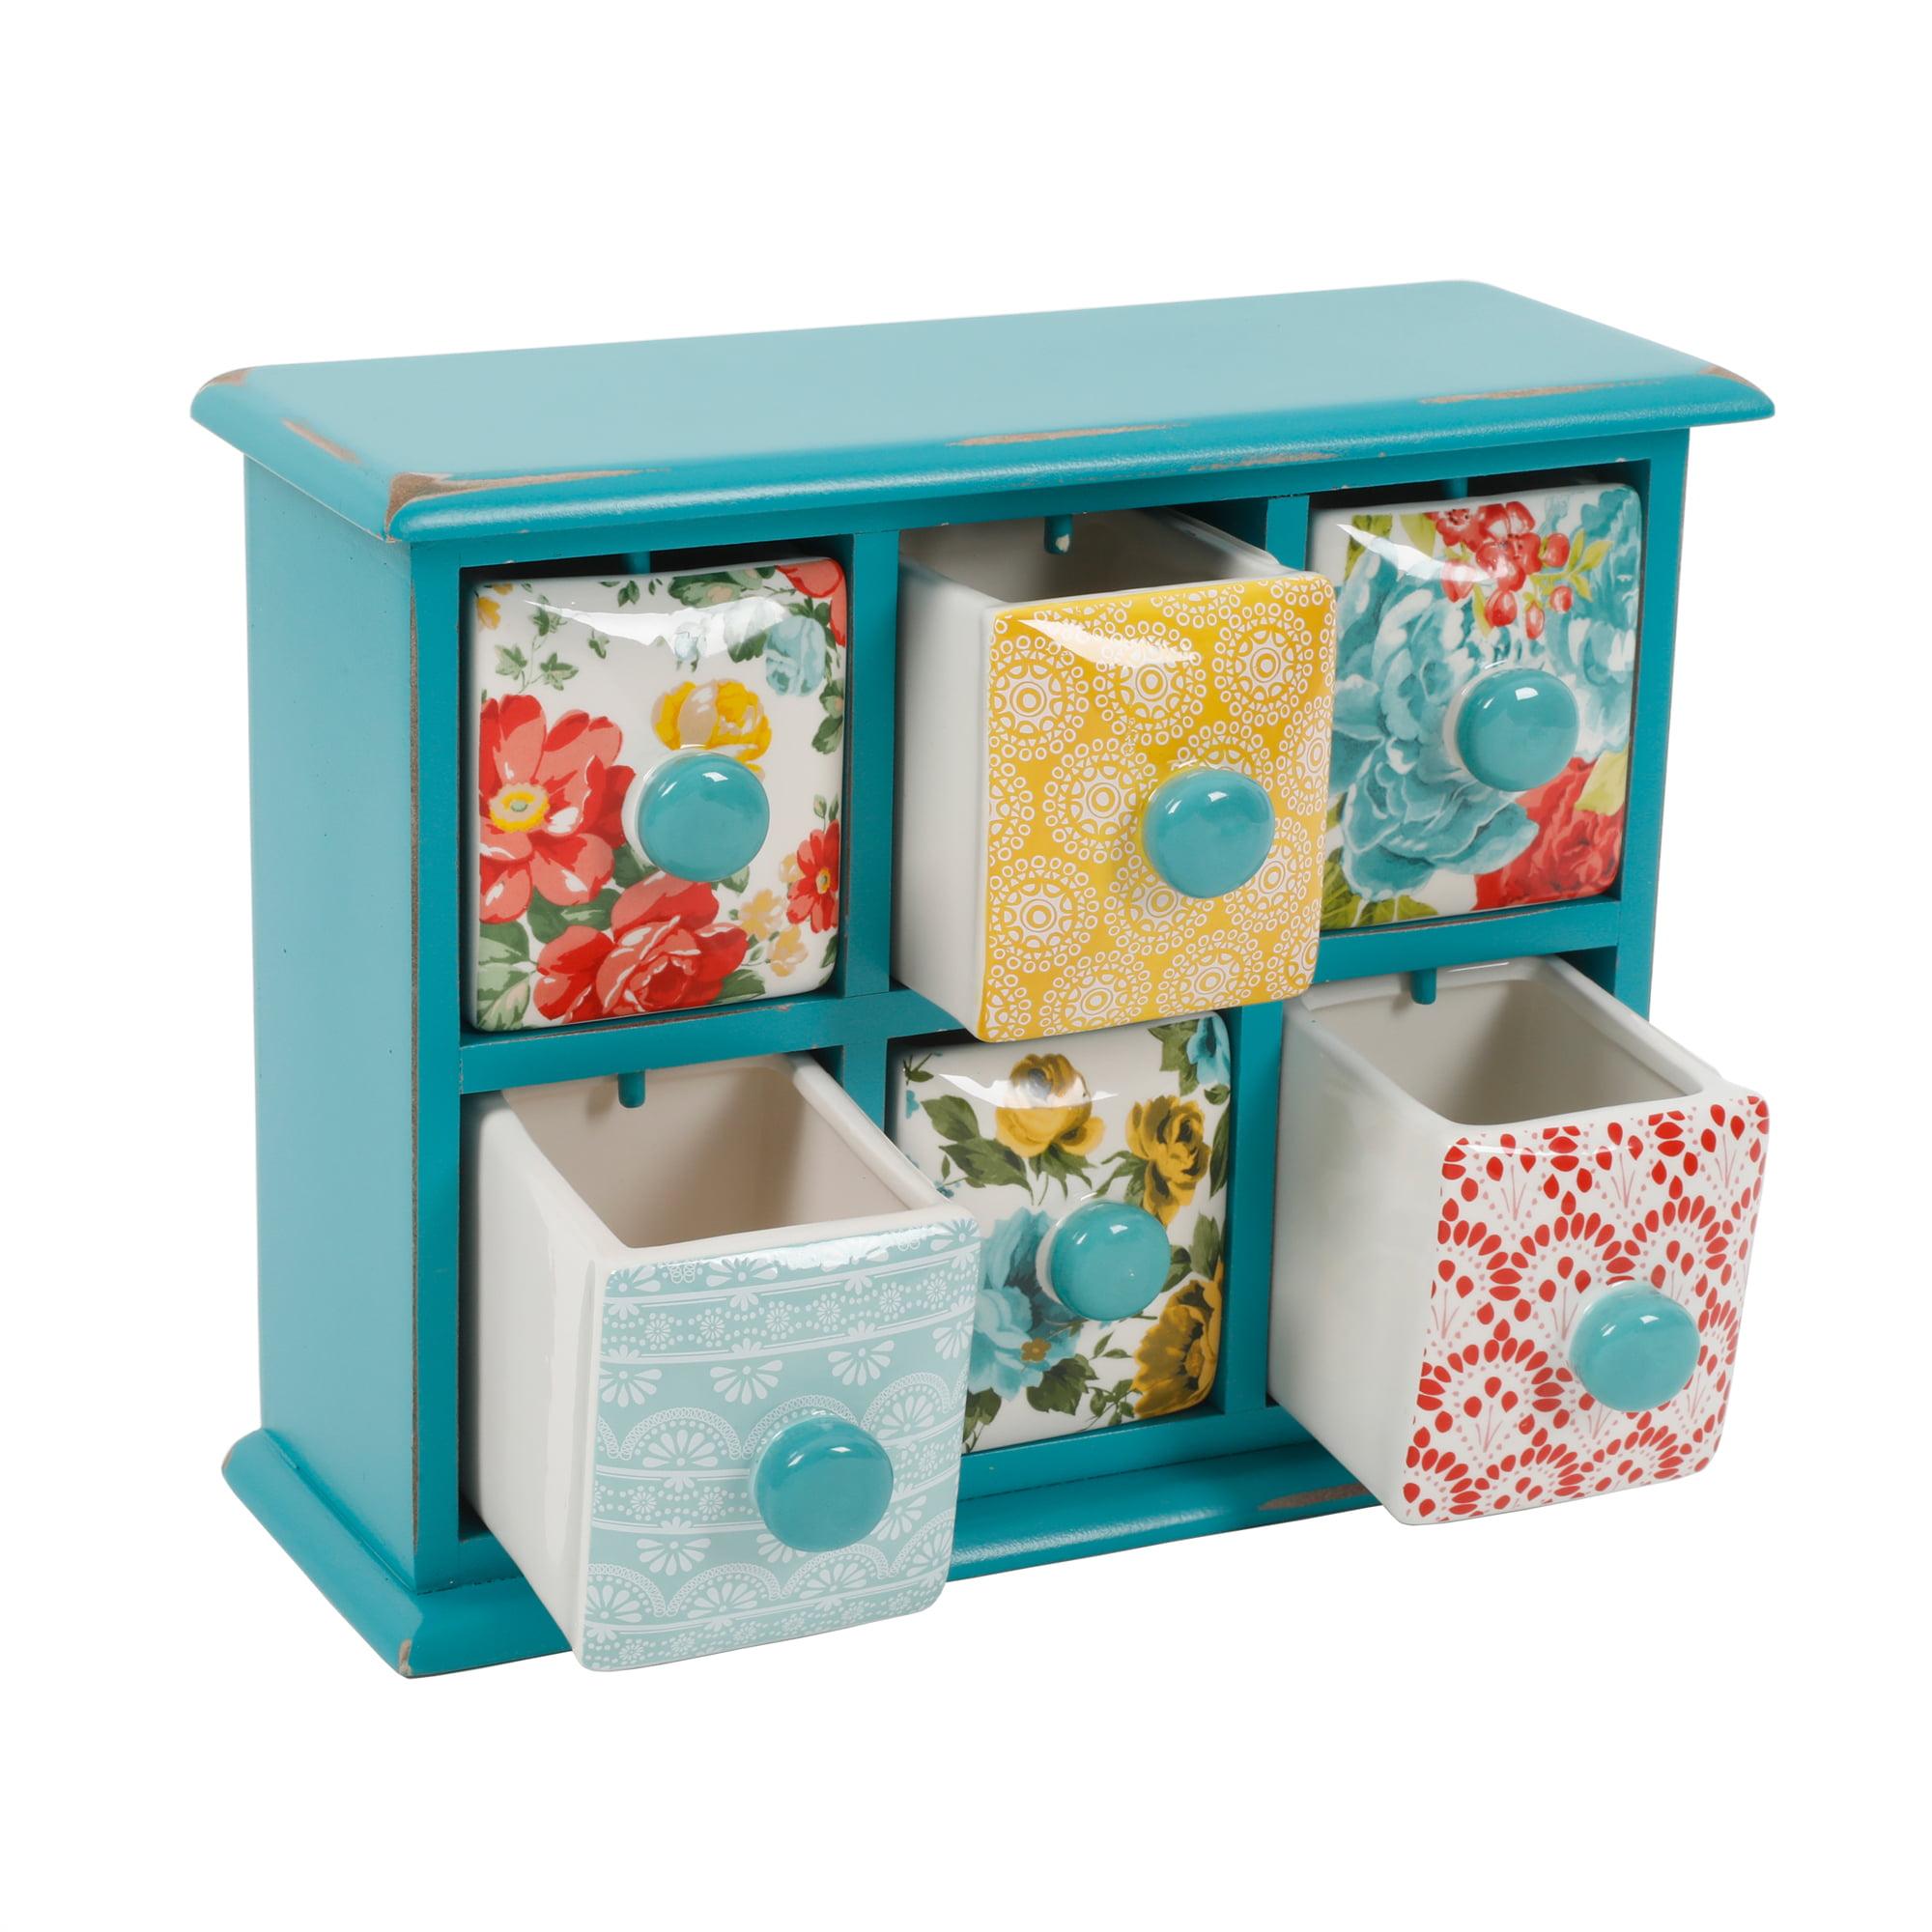 The Pioneer Woman Vintage Floral 6-Drawer Spice /Tea Box - Walmart.com